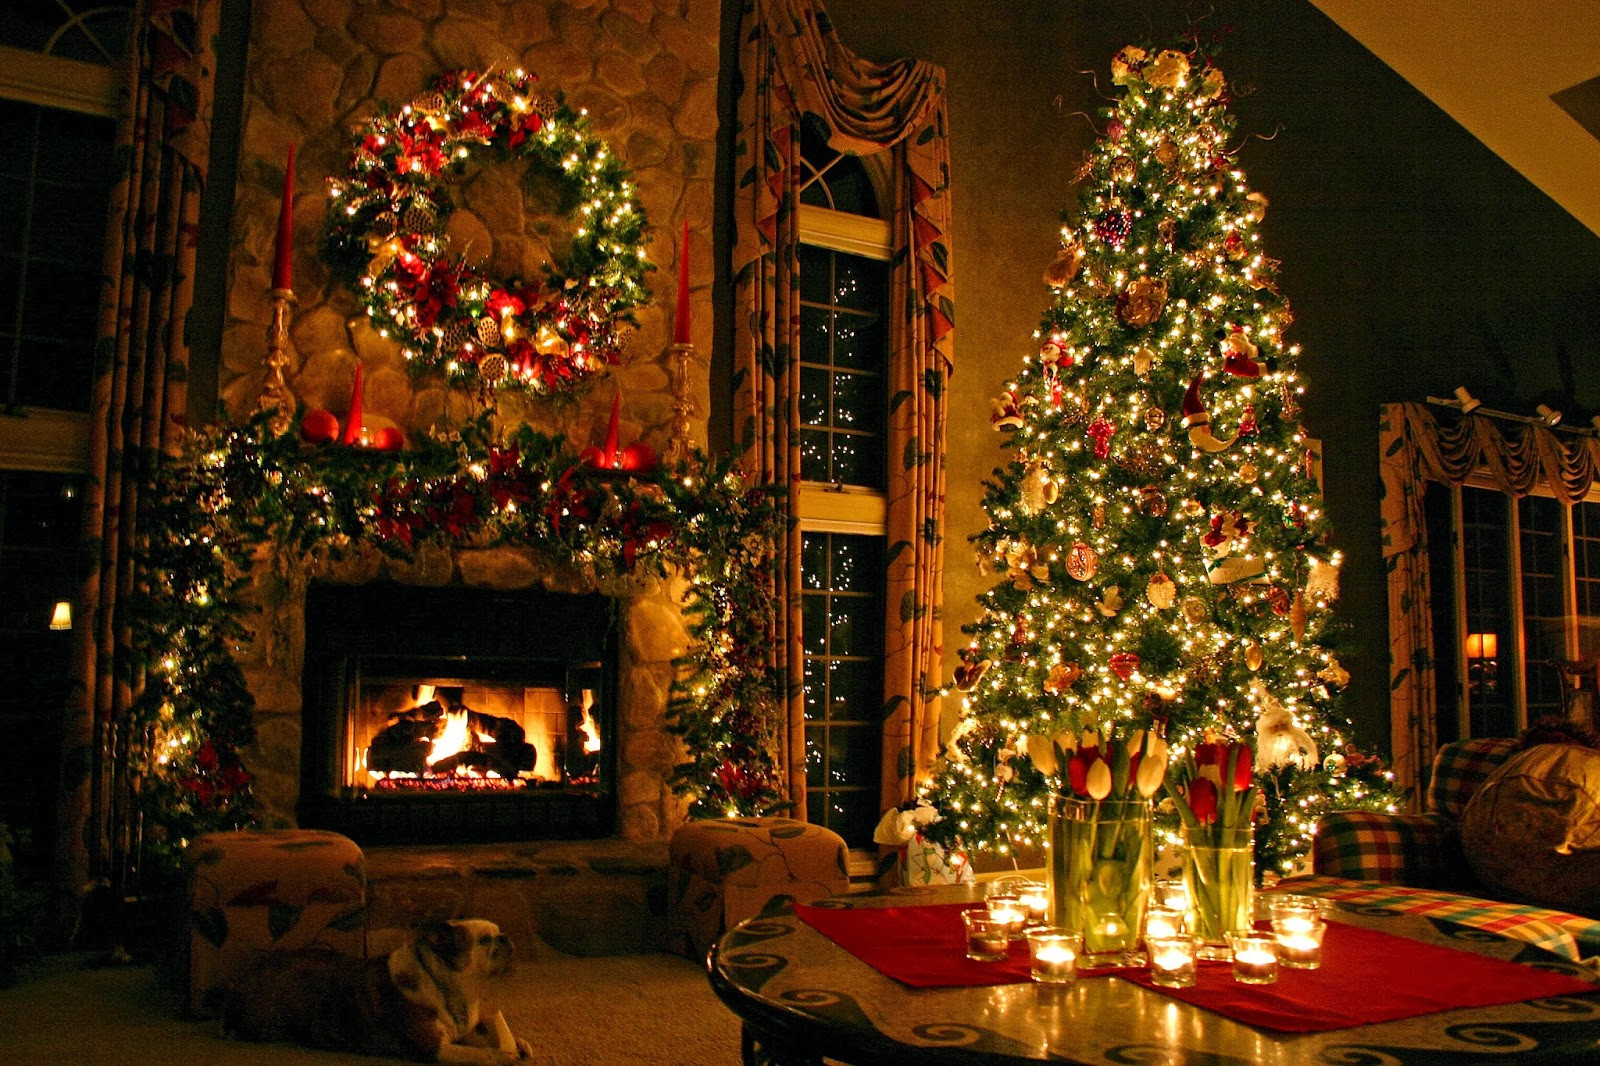 Christmas Tree Fireplace  Simply elegant – easy Christmas decorating ideas – LifeStuffs